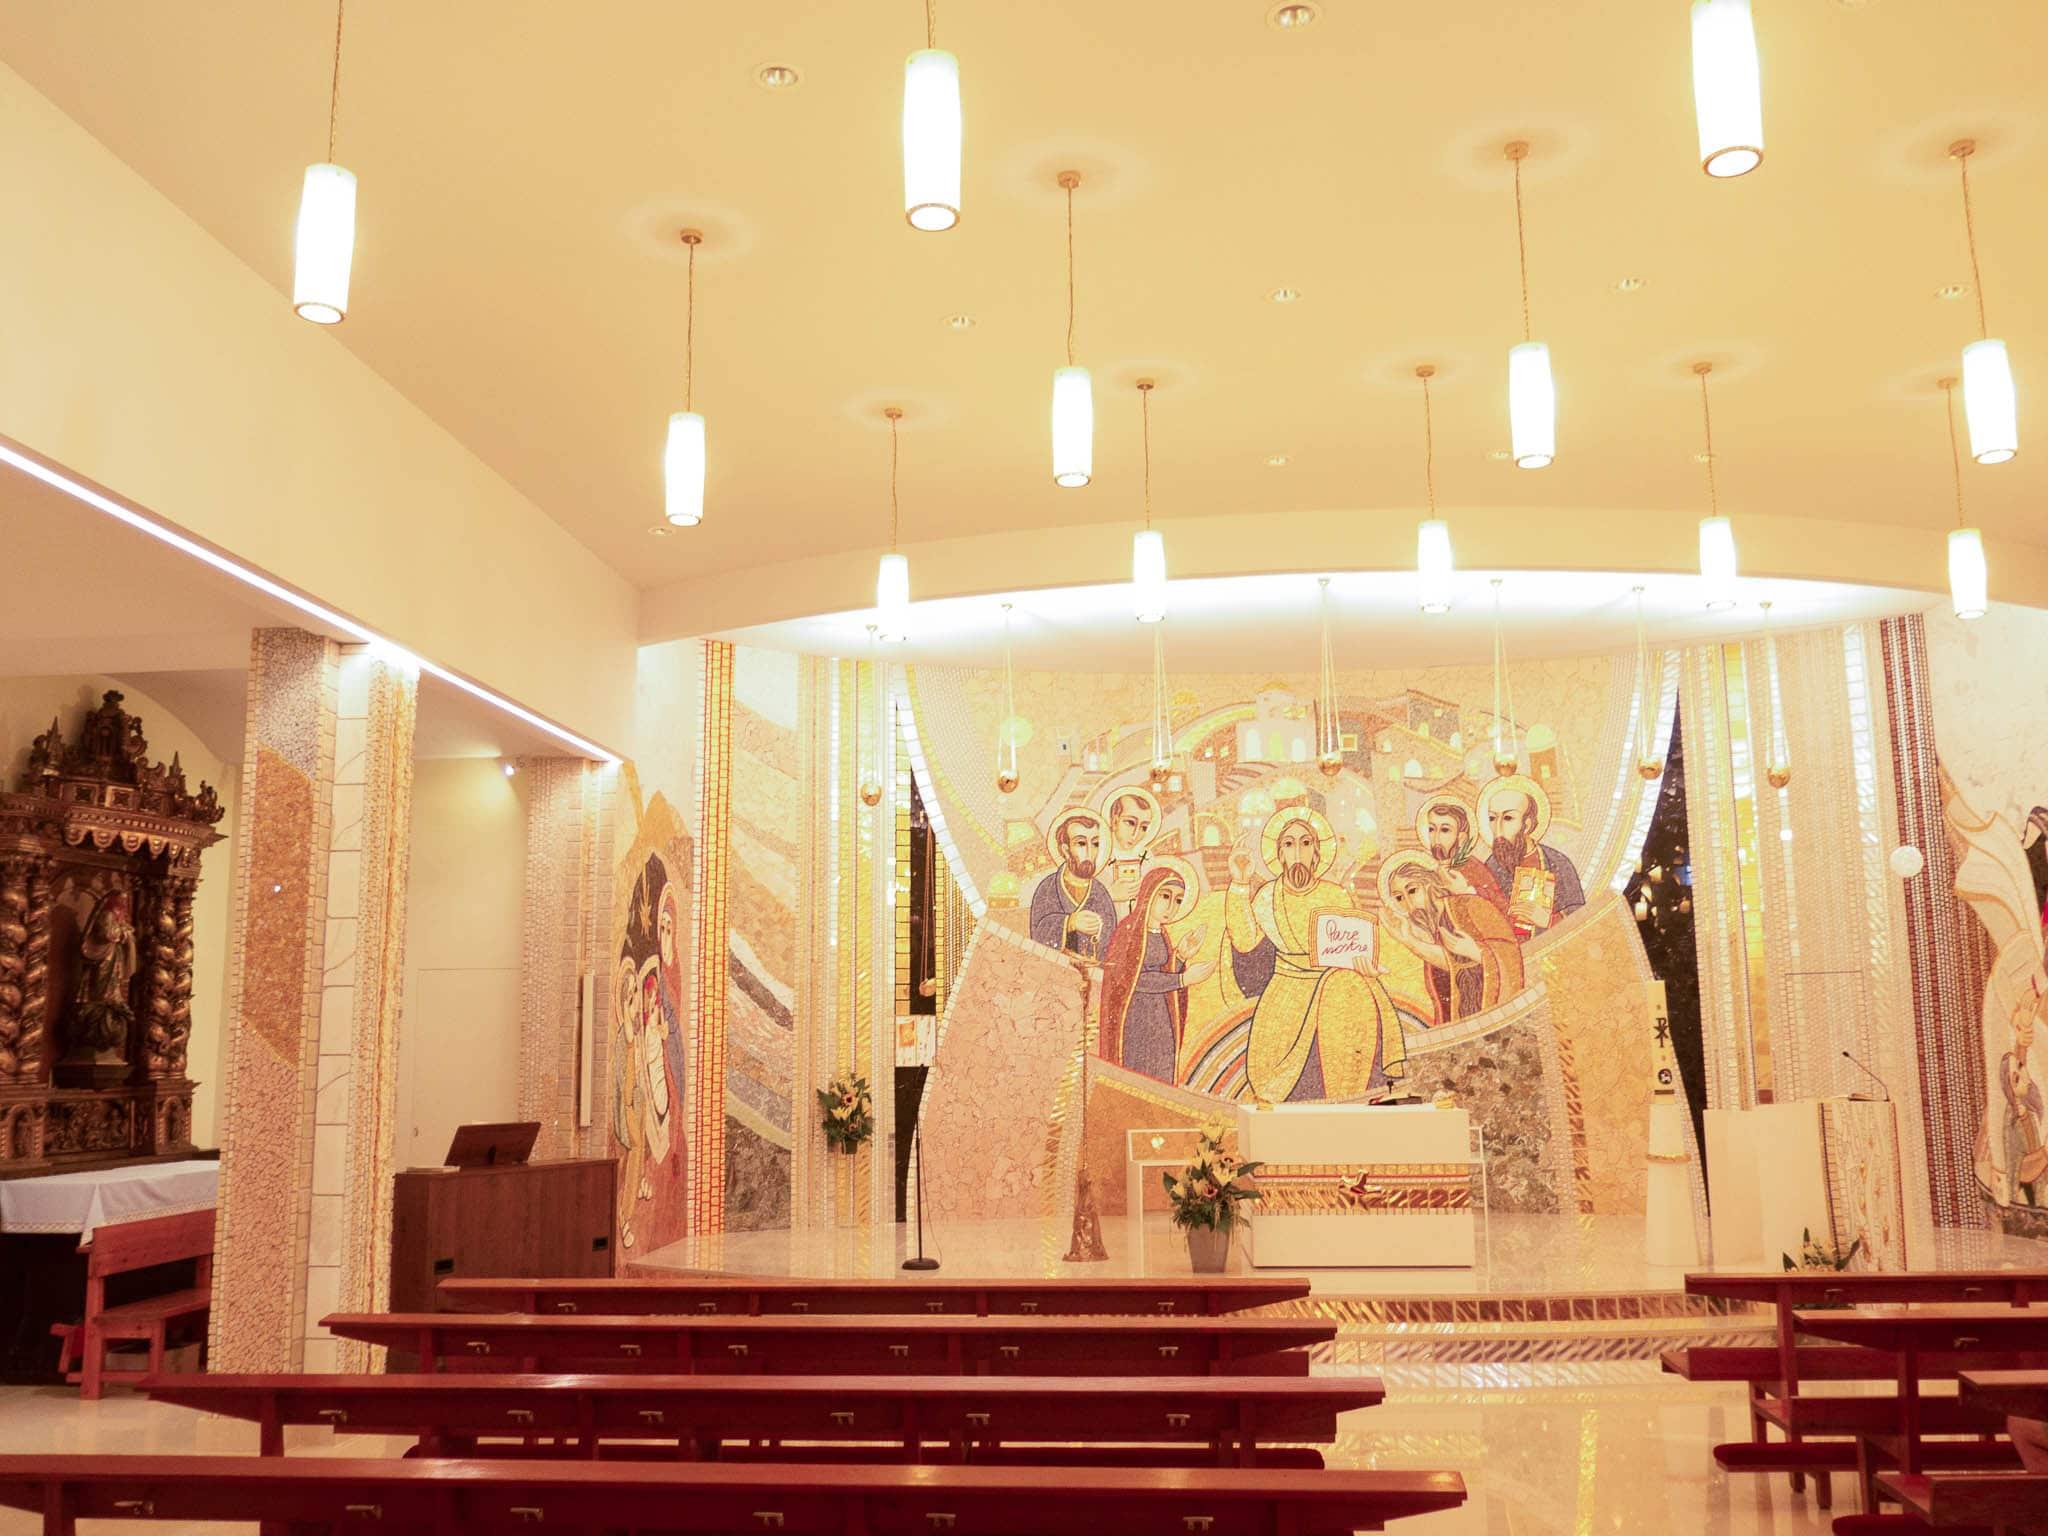 Mosaik von Marko Ivan Rupnik in Kirche in Andorra